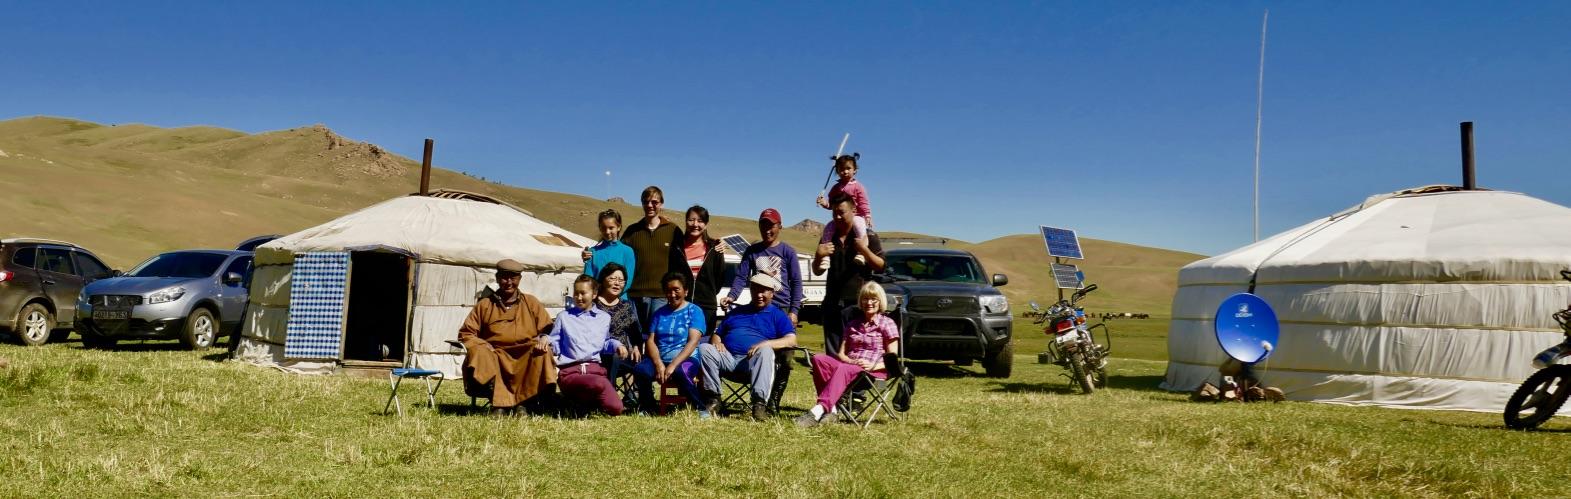 Mongolei-Reise bei den Nomaden